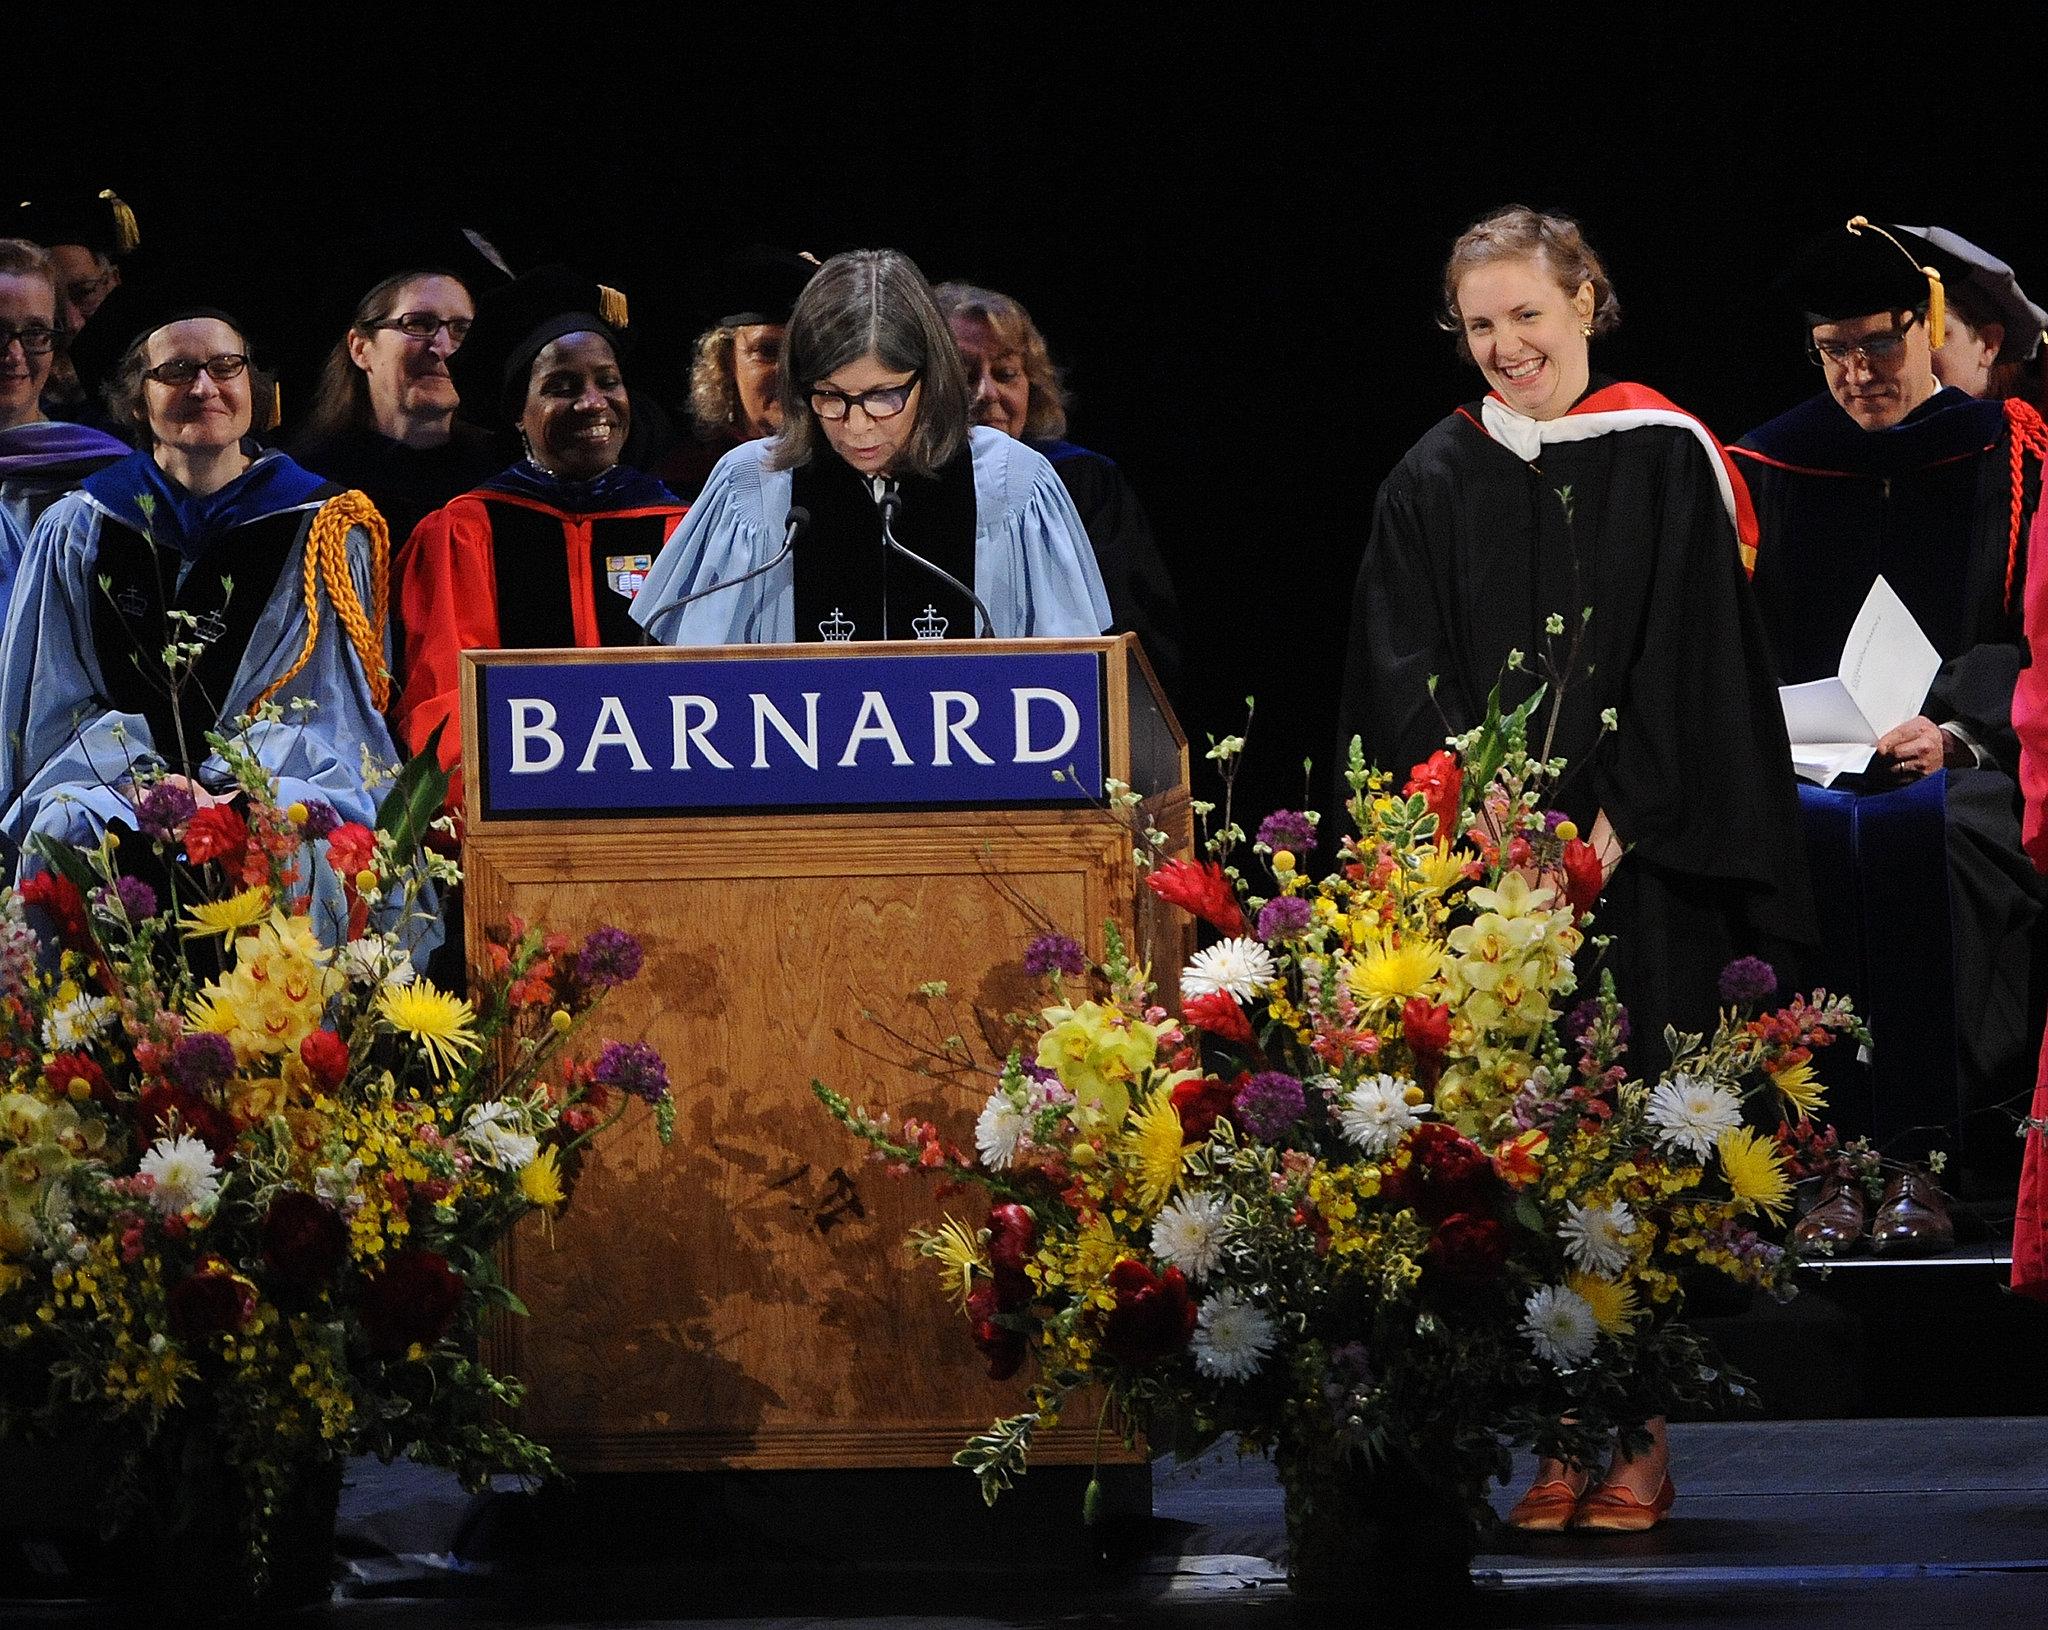 Lena Dunham received the Barnard Medal of Distinction on Sunday.